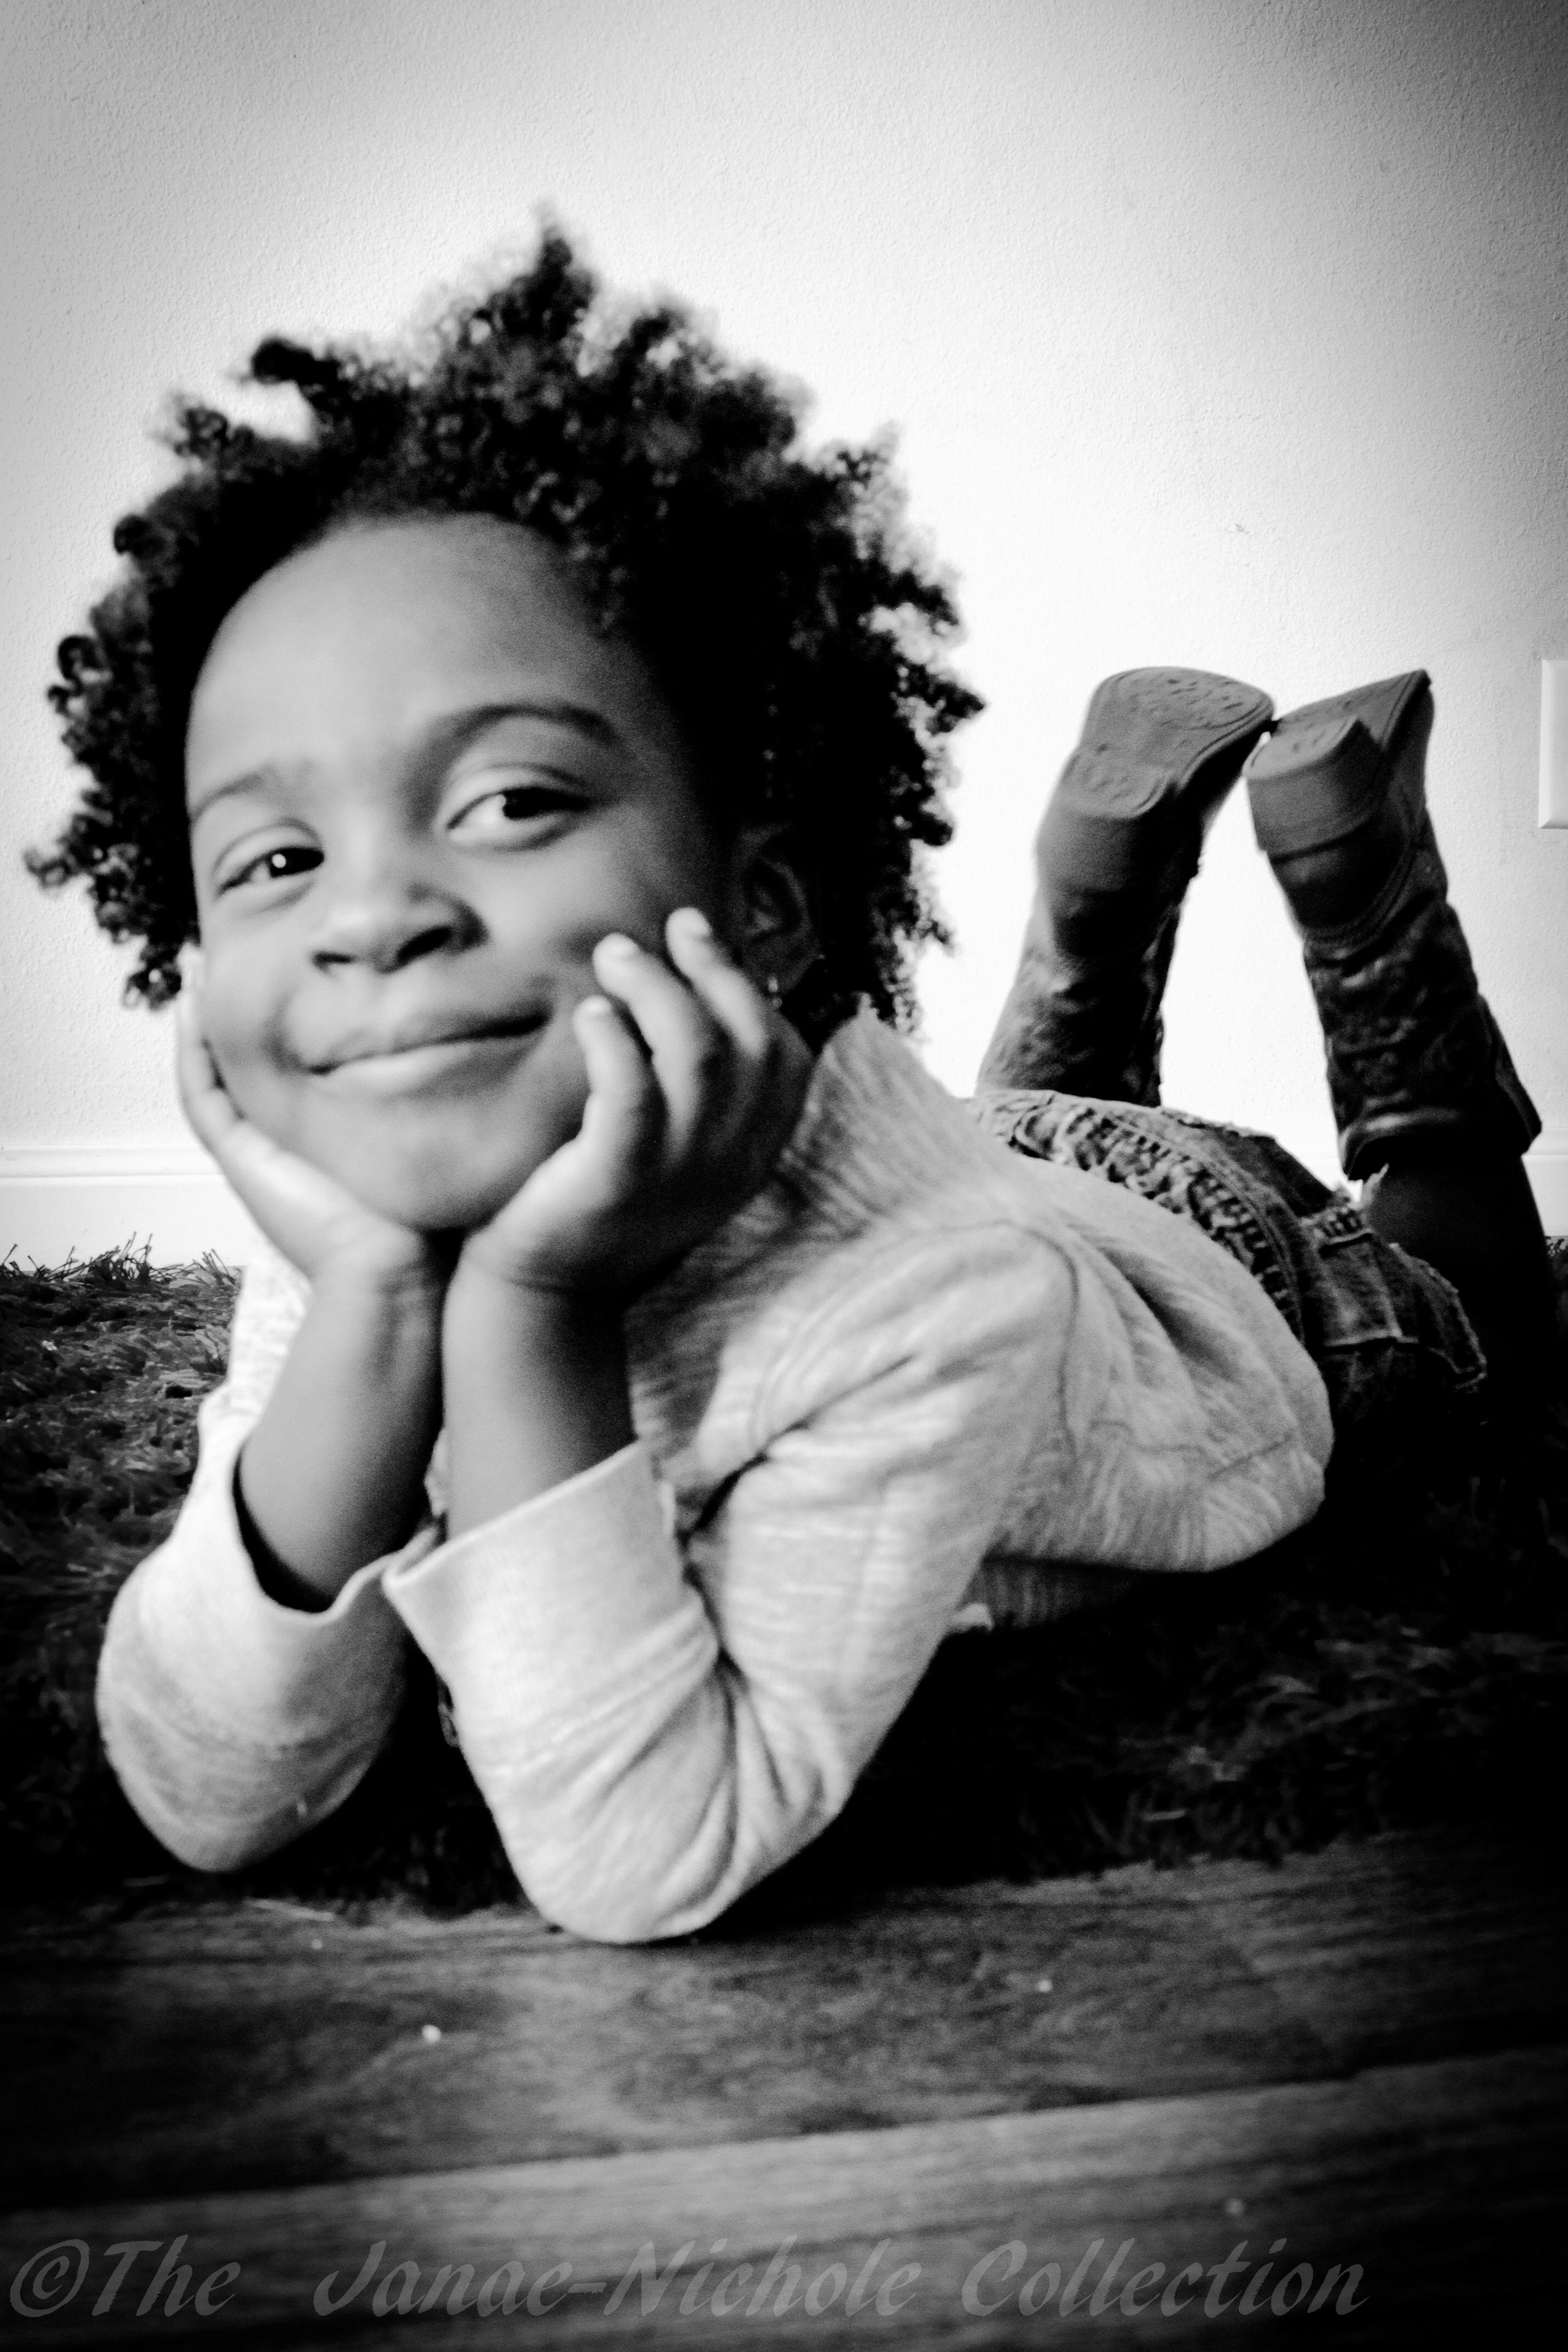 She is beautiful!!! #naturalhair#modelchild#thejanae_nichole#captureasmile#Hair#Twistout